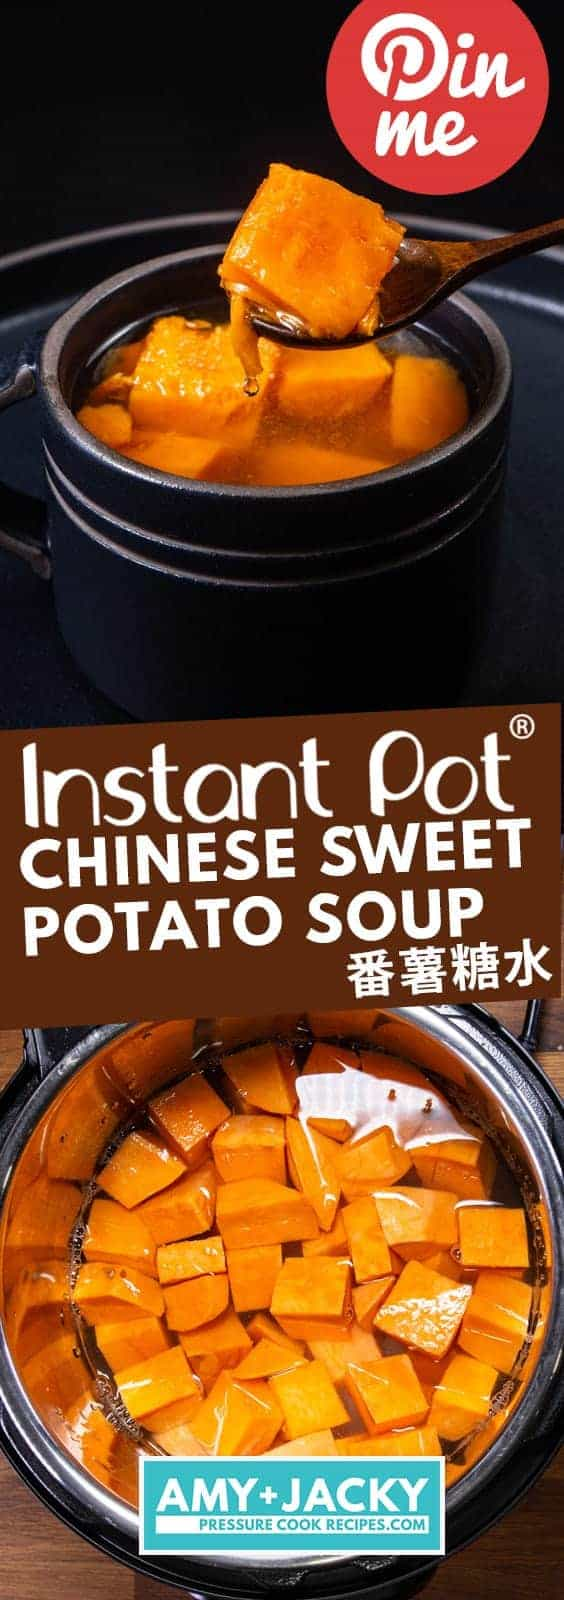 Instant Pot Chinese Sweet Potato Soup | 壓力鍋番薯糖水 | Pressure Cooker Chinese Sweet Potato Soup | 番薯姜糖水 | Sweet Potato Soup | Instant Pot Chinese Recipes | Instant Pot Dessert | Instant Pot Recipes | Instant Pot Soup #recipes #chinese #dessert